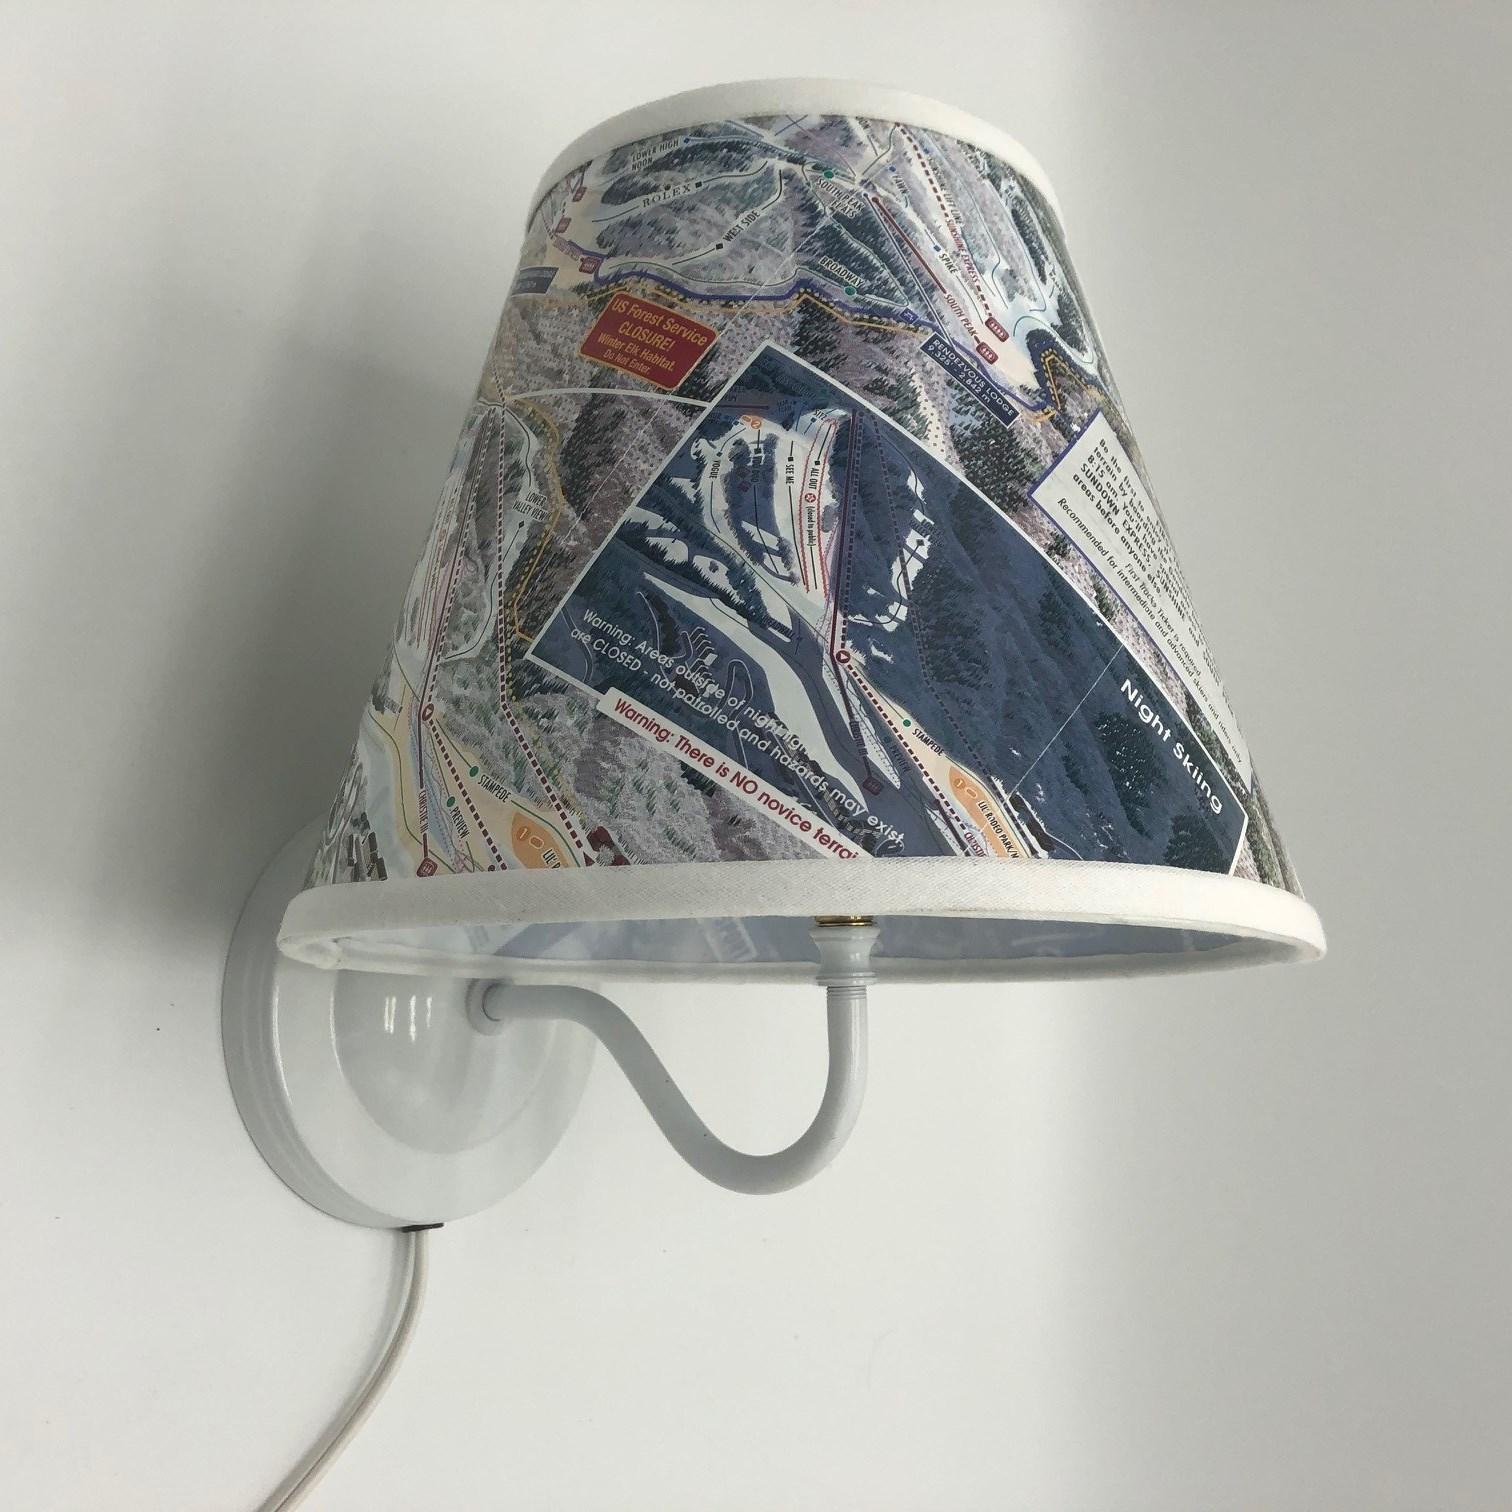 Pinup Lamp with Ski Lampshade